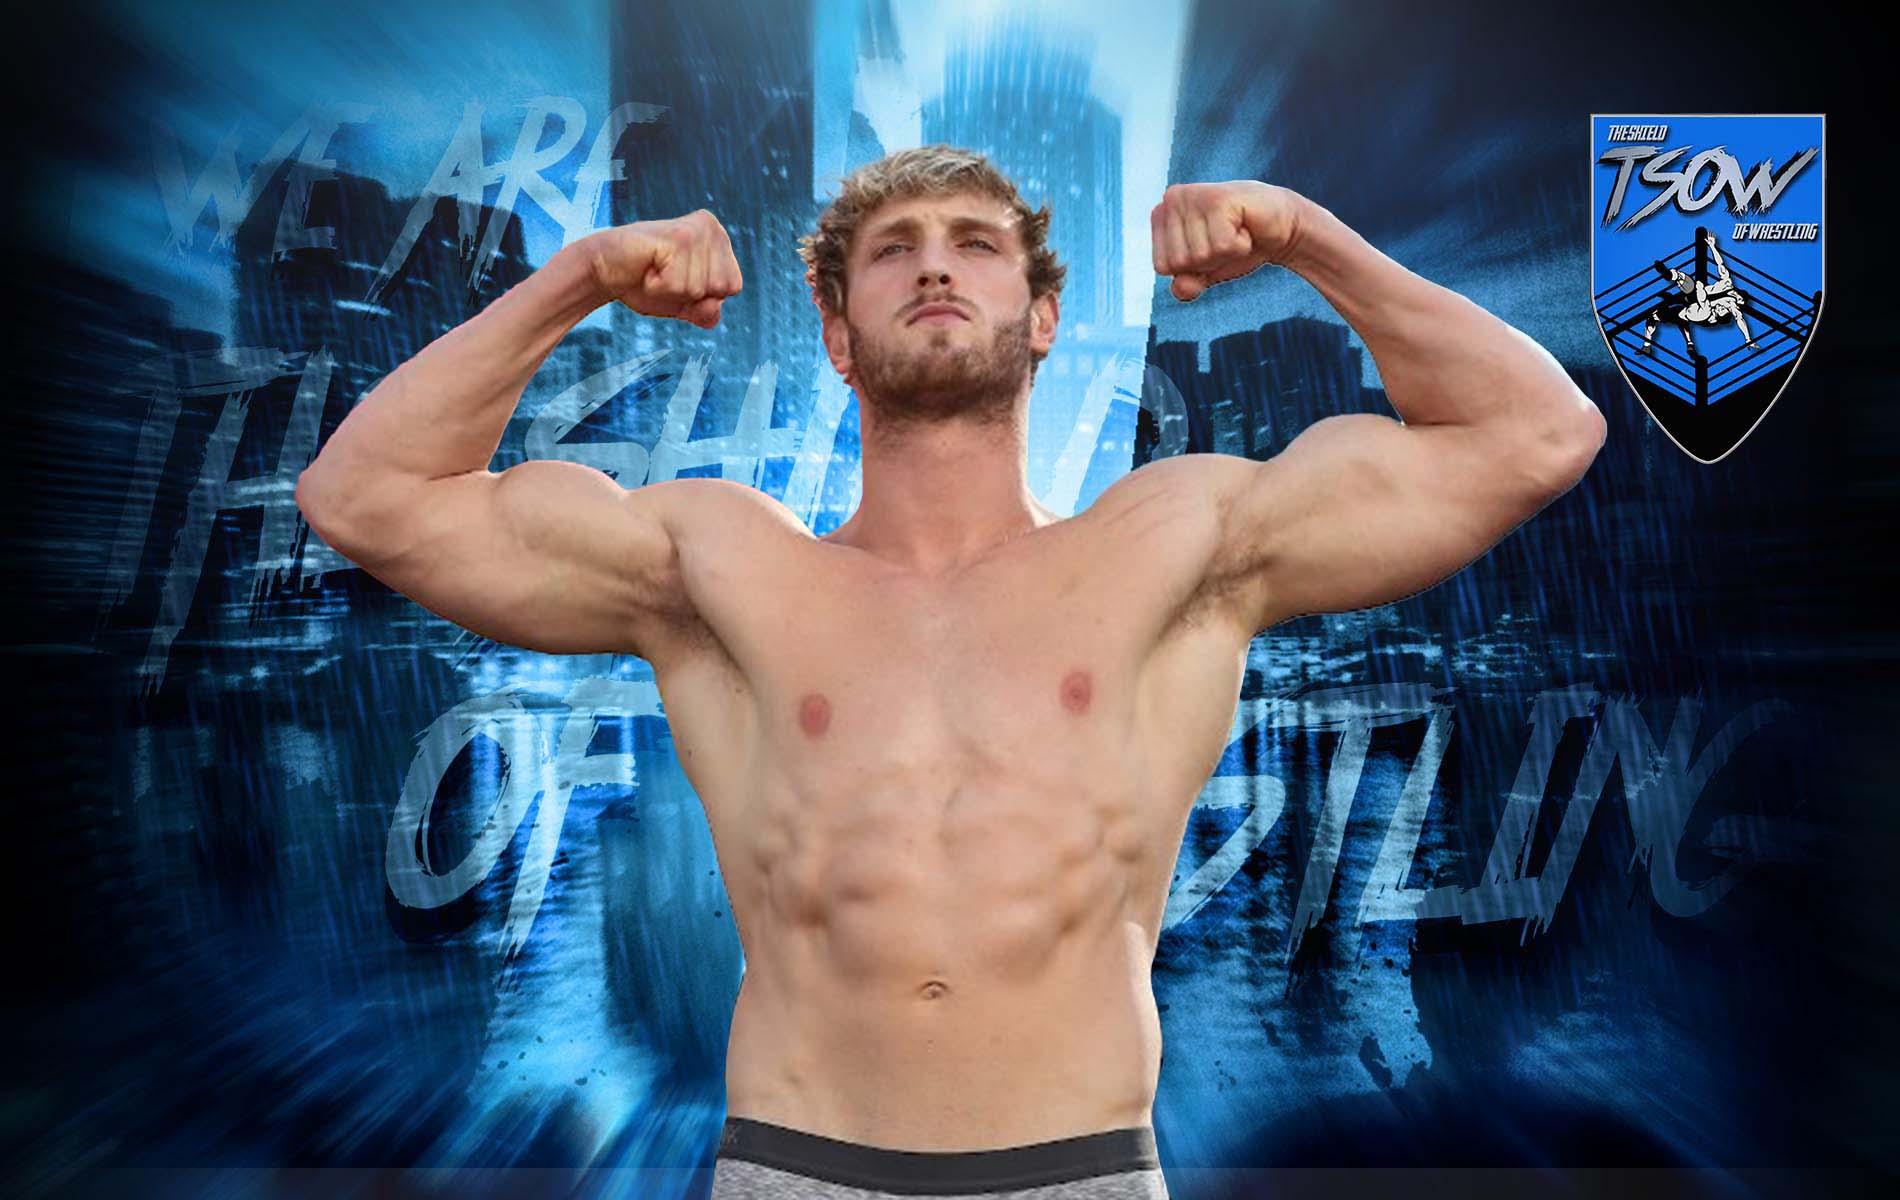 Logan Paul a SmackDown: il suo commento sui social